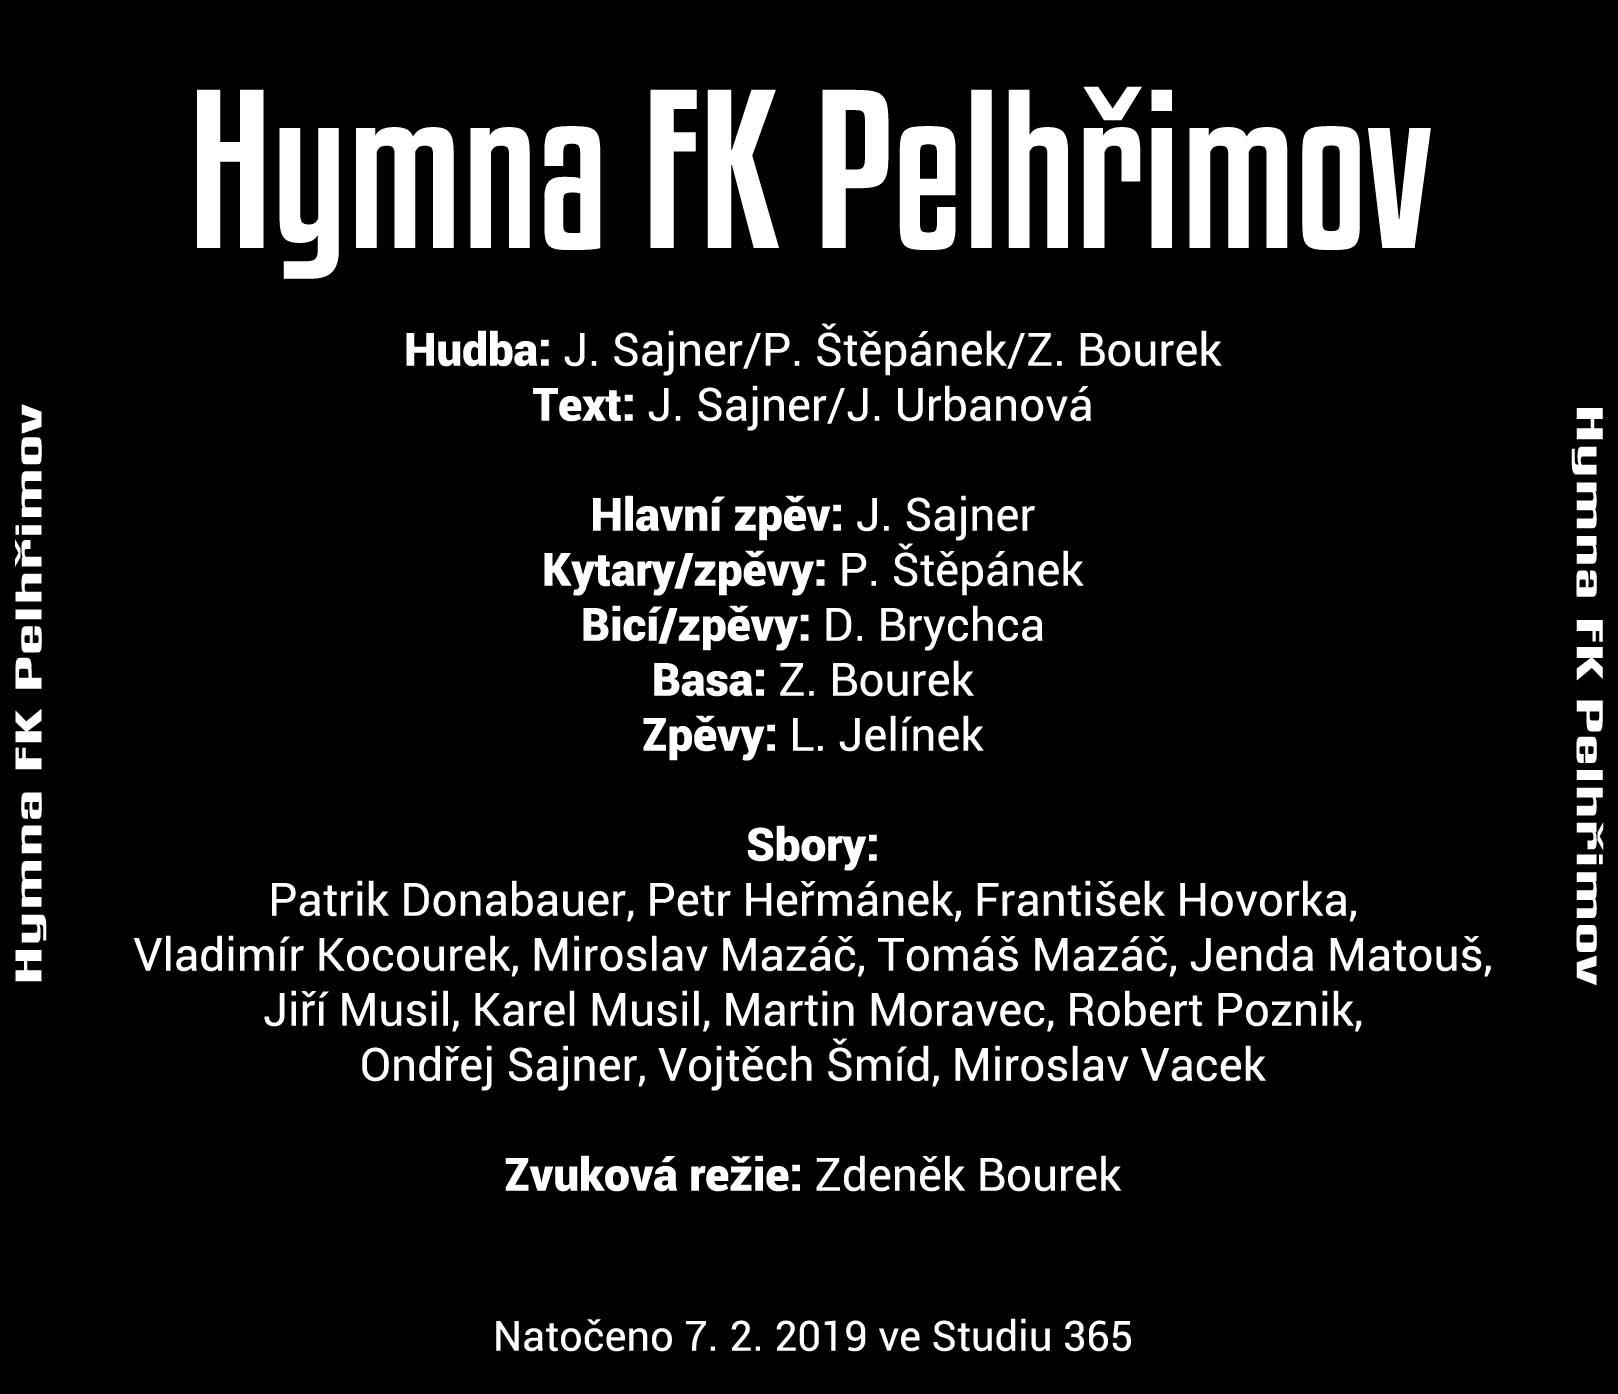 Slova hymny FK Pelhřimov